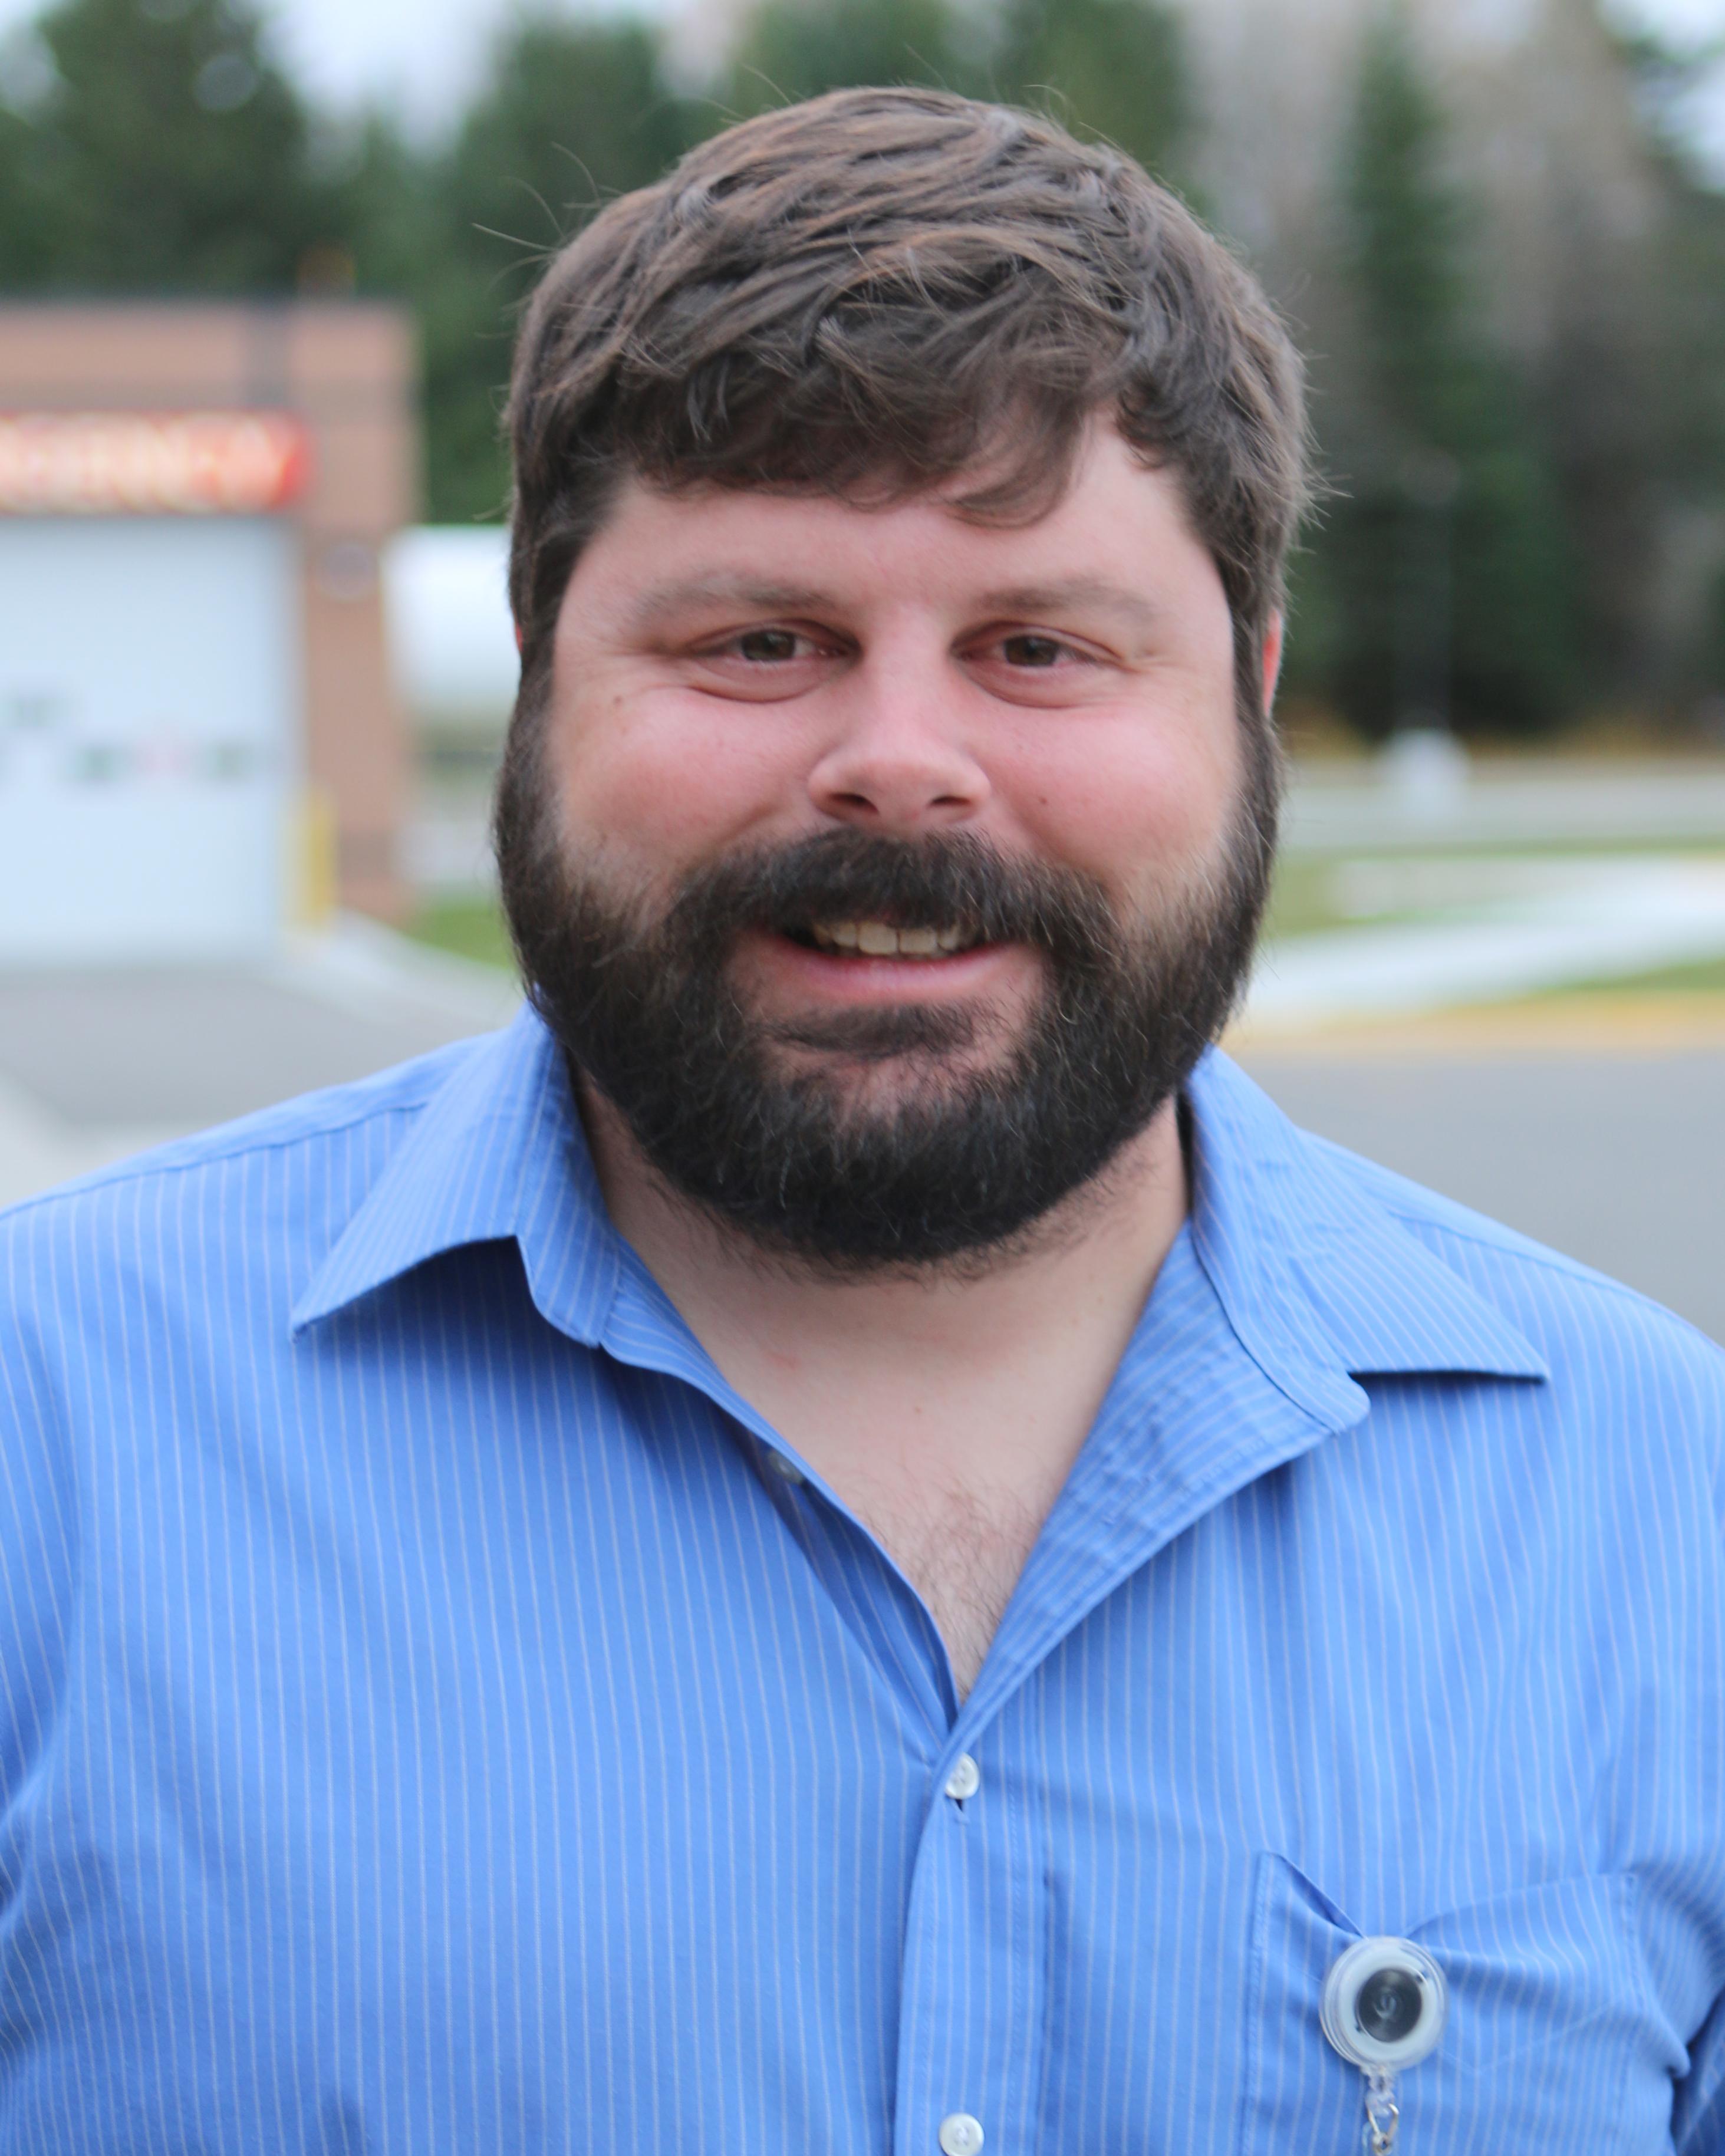 NICHOLAS VIDOR, MD